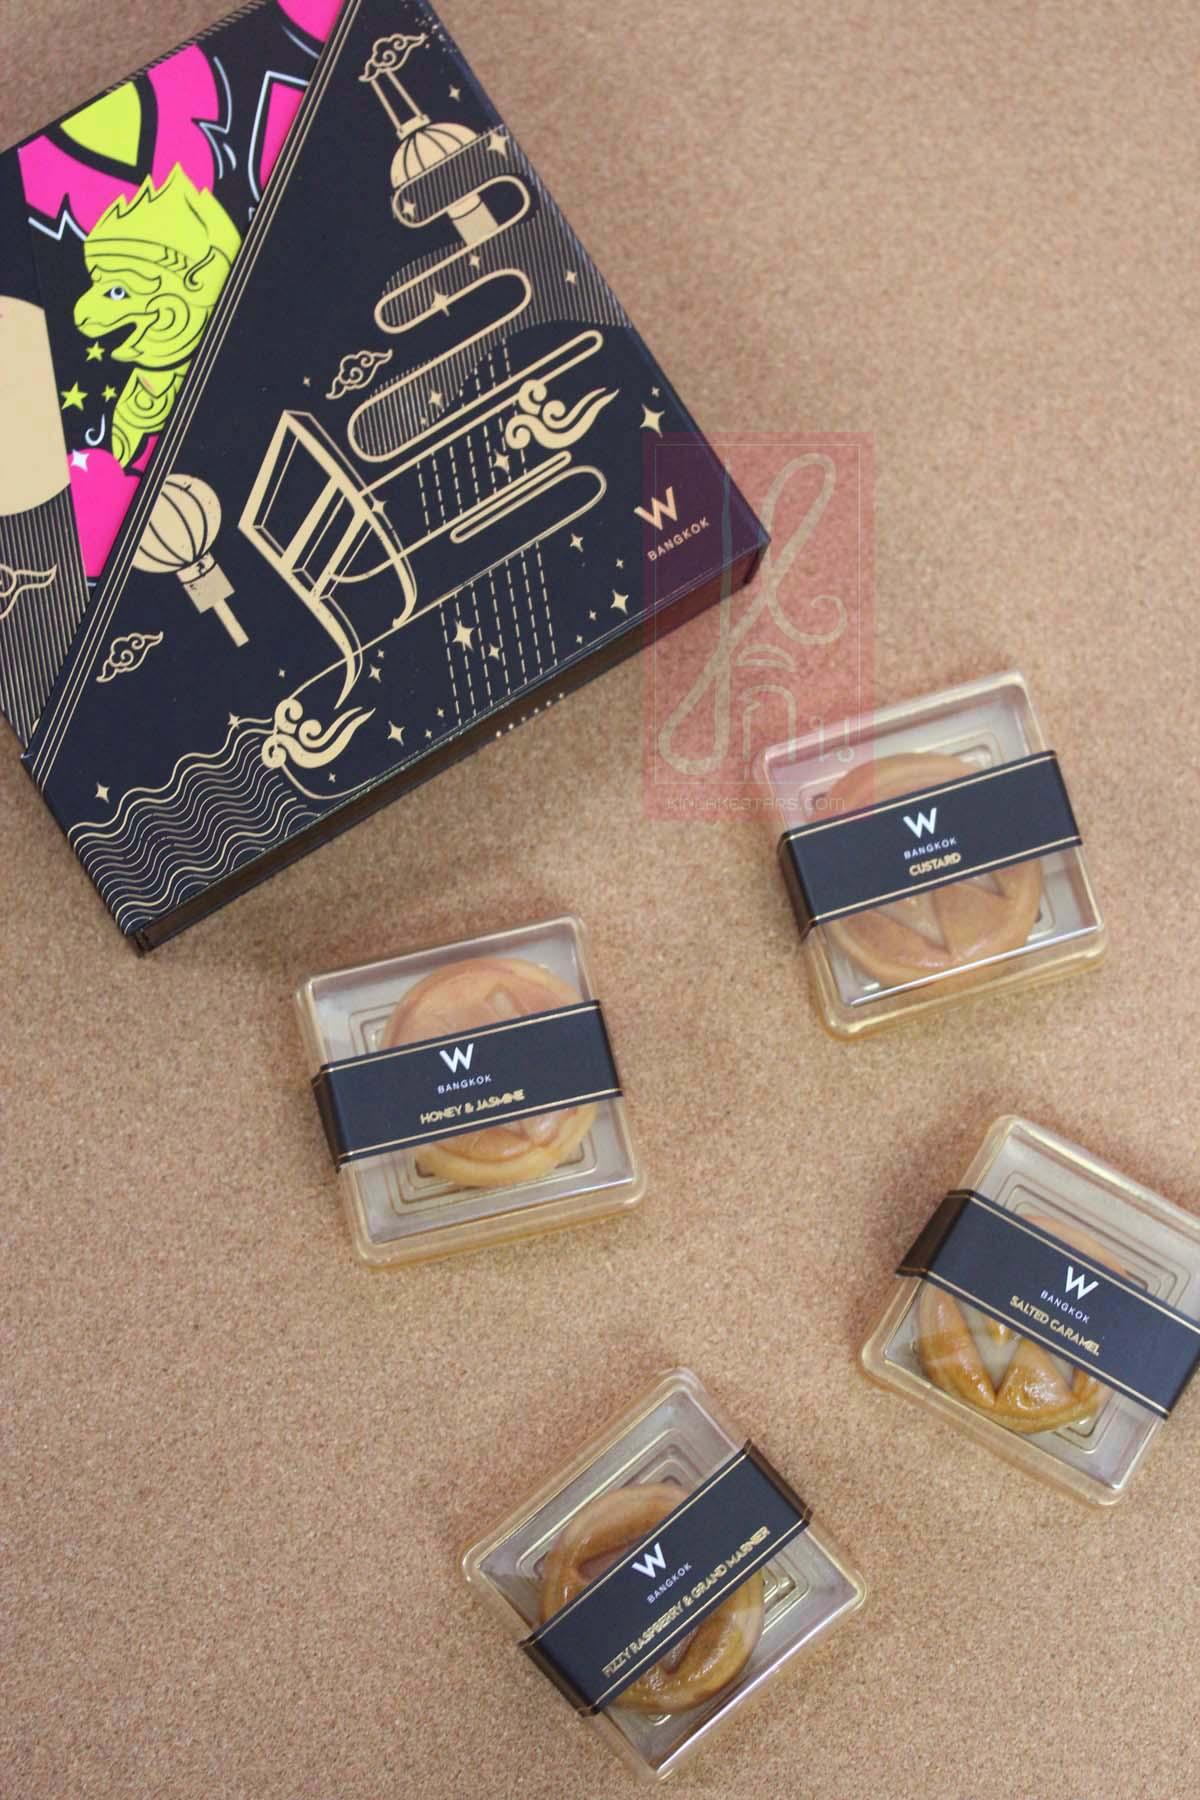 IMG_7544W_bangkok_mooncake_review